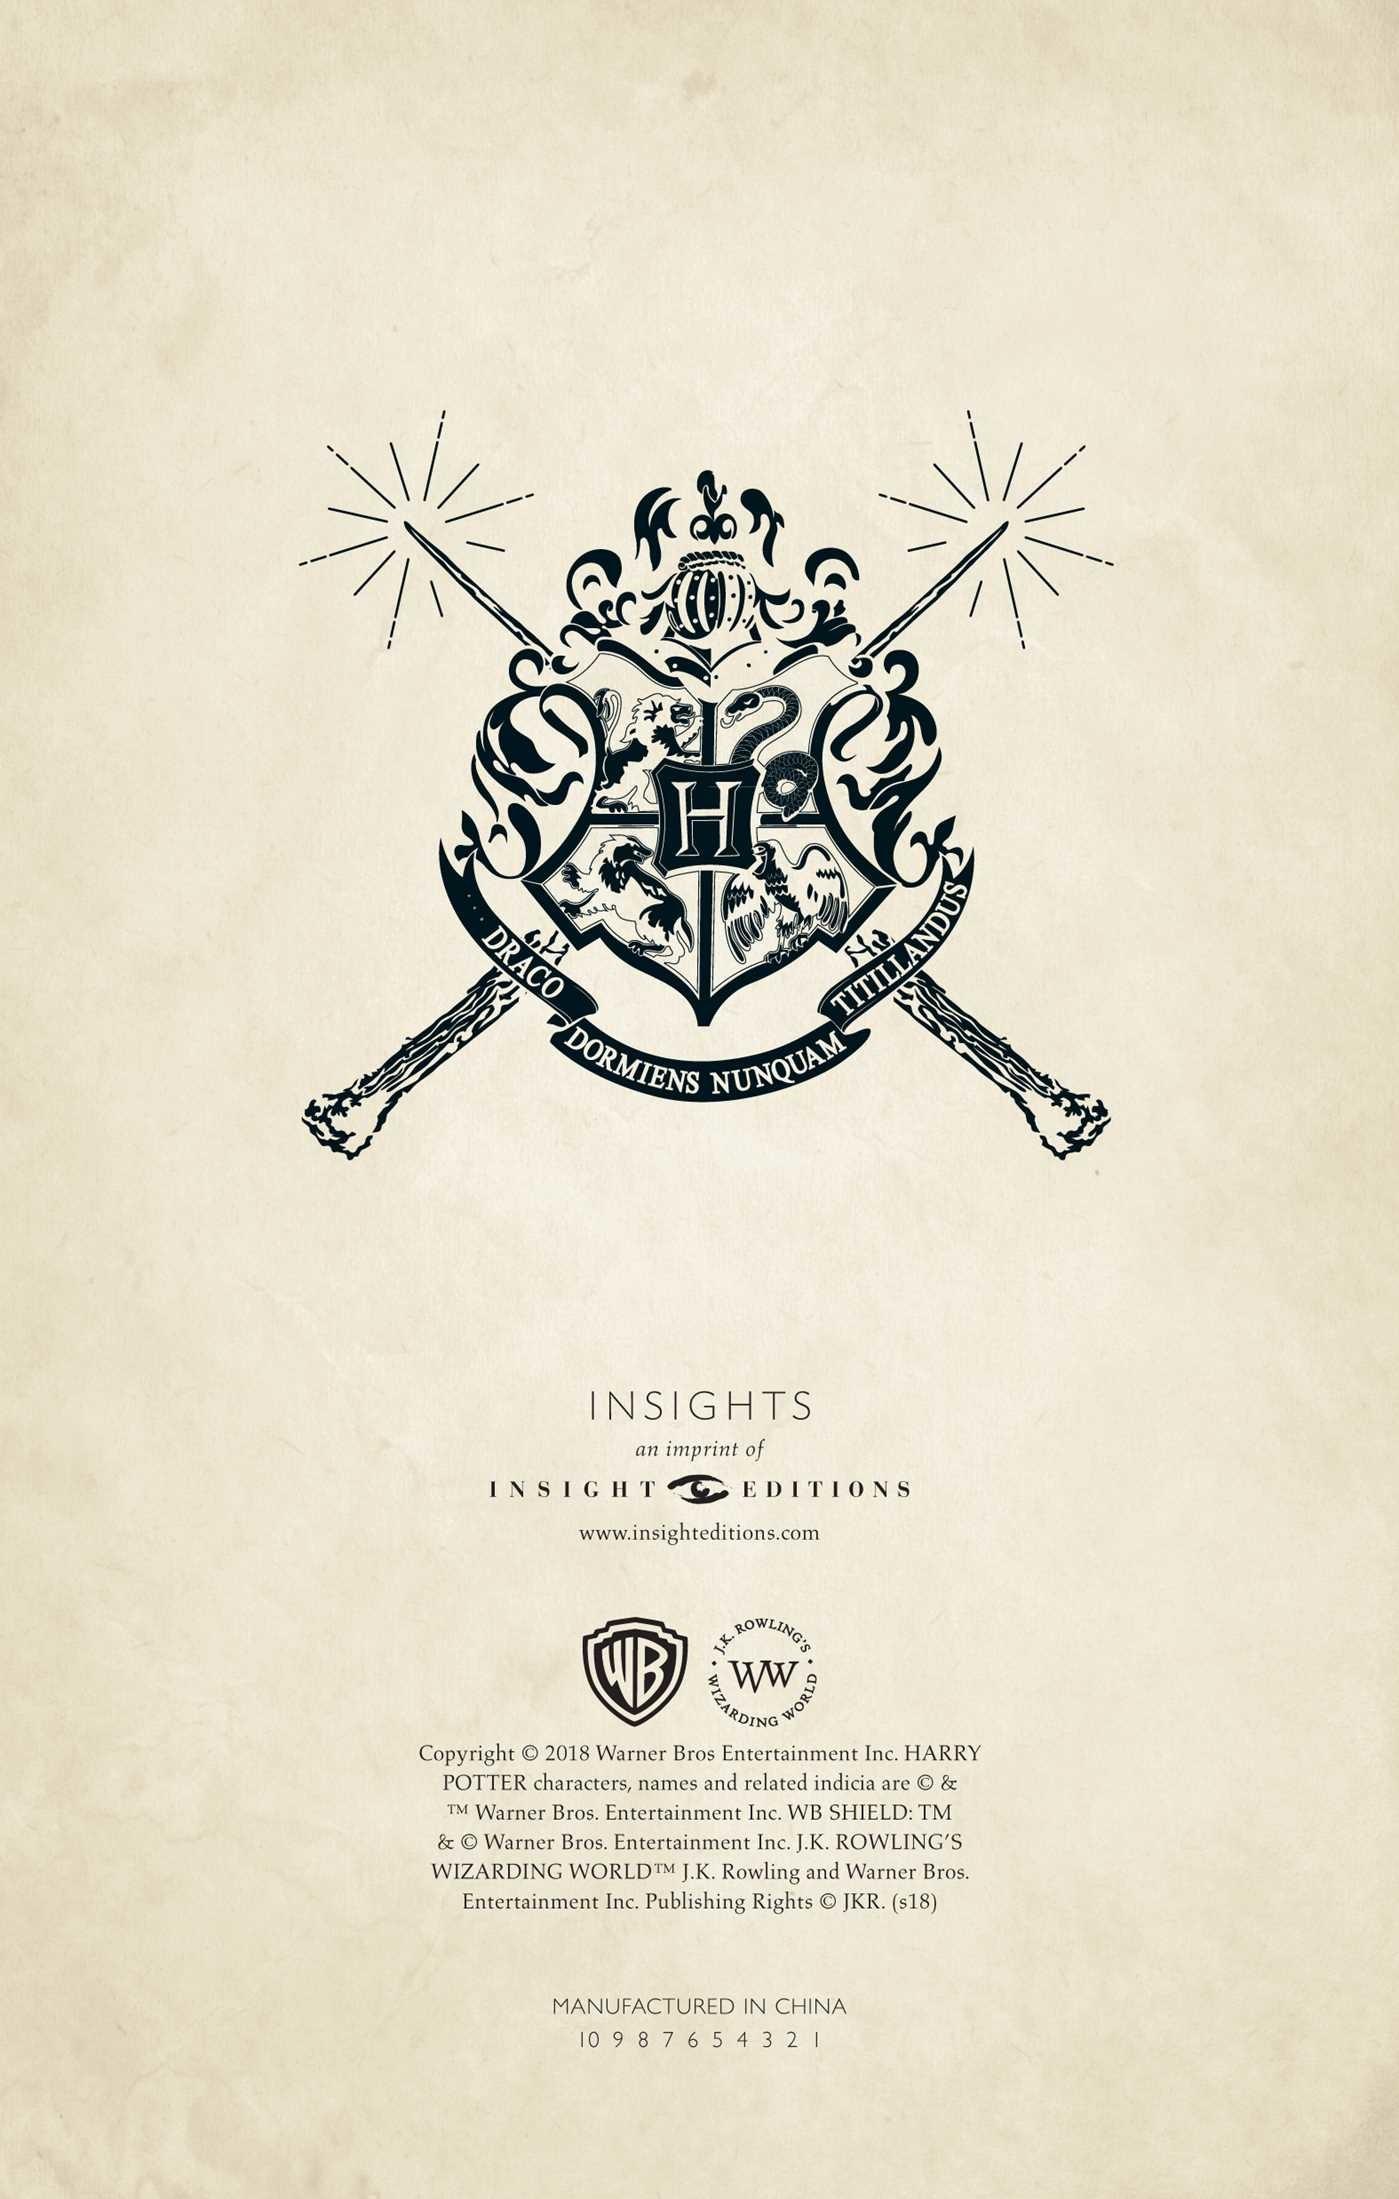 Harry Potter Hogwarts Ruled Pocket Journal Book By Insight